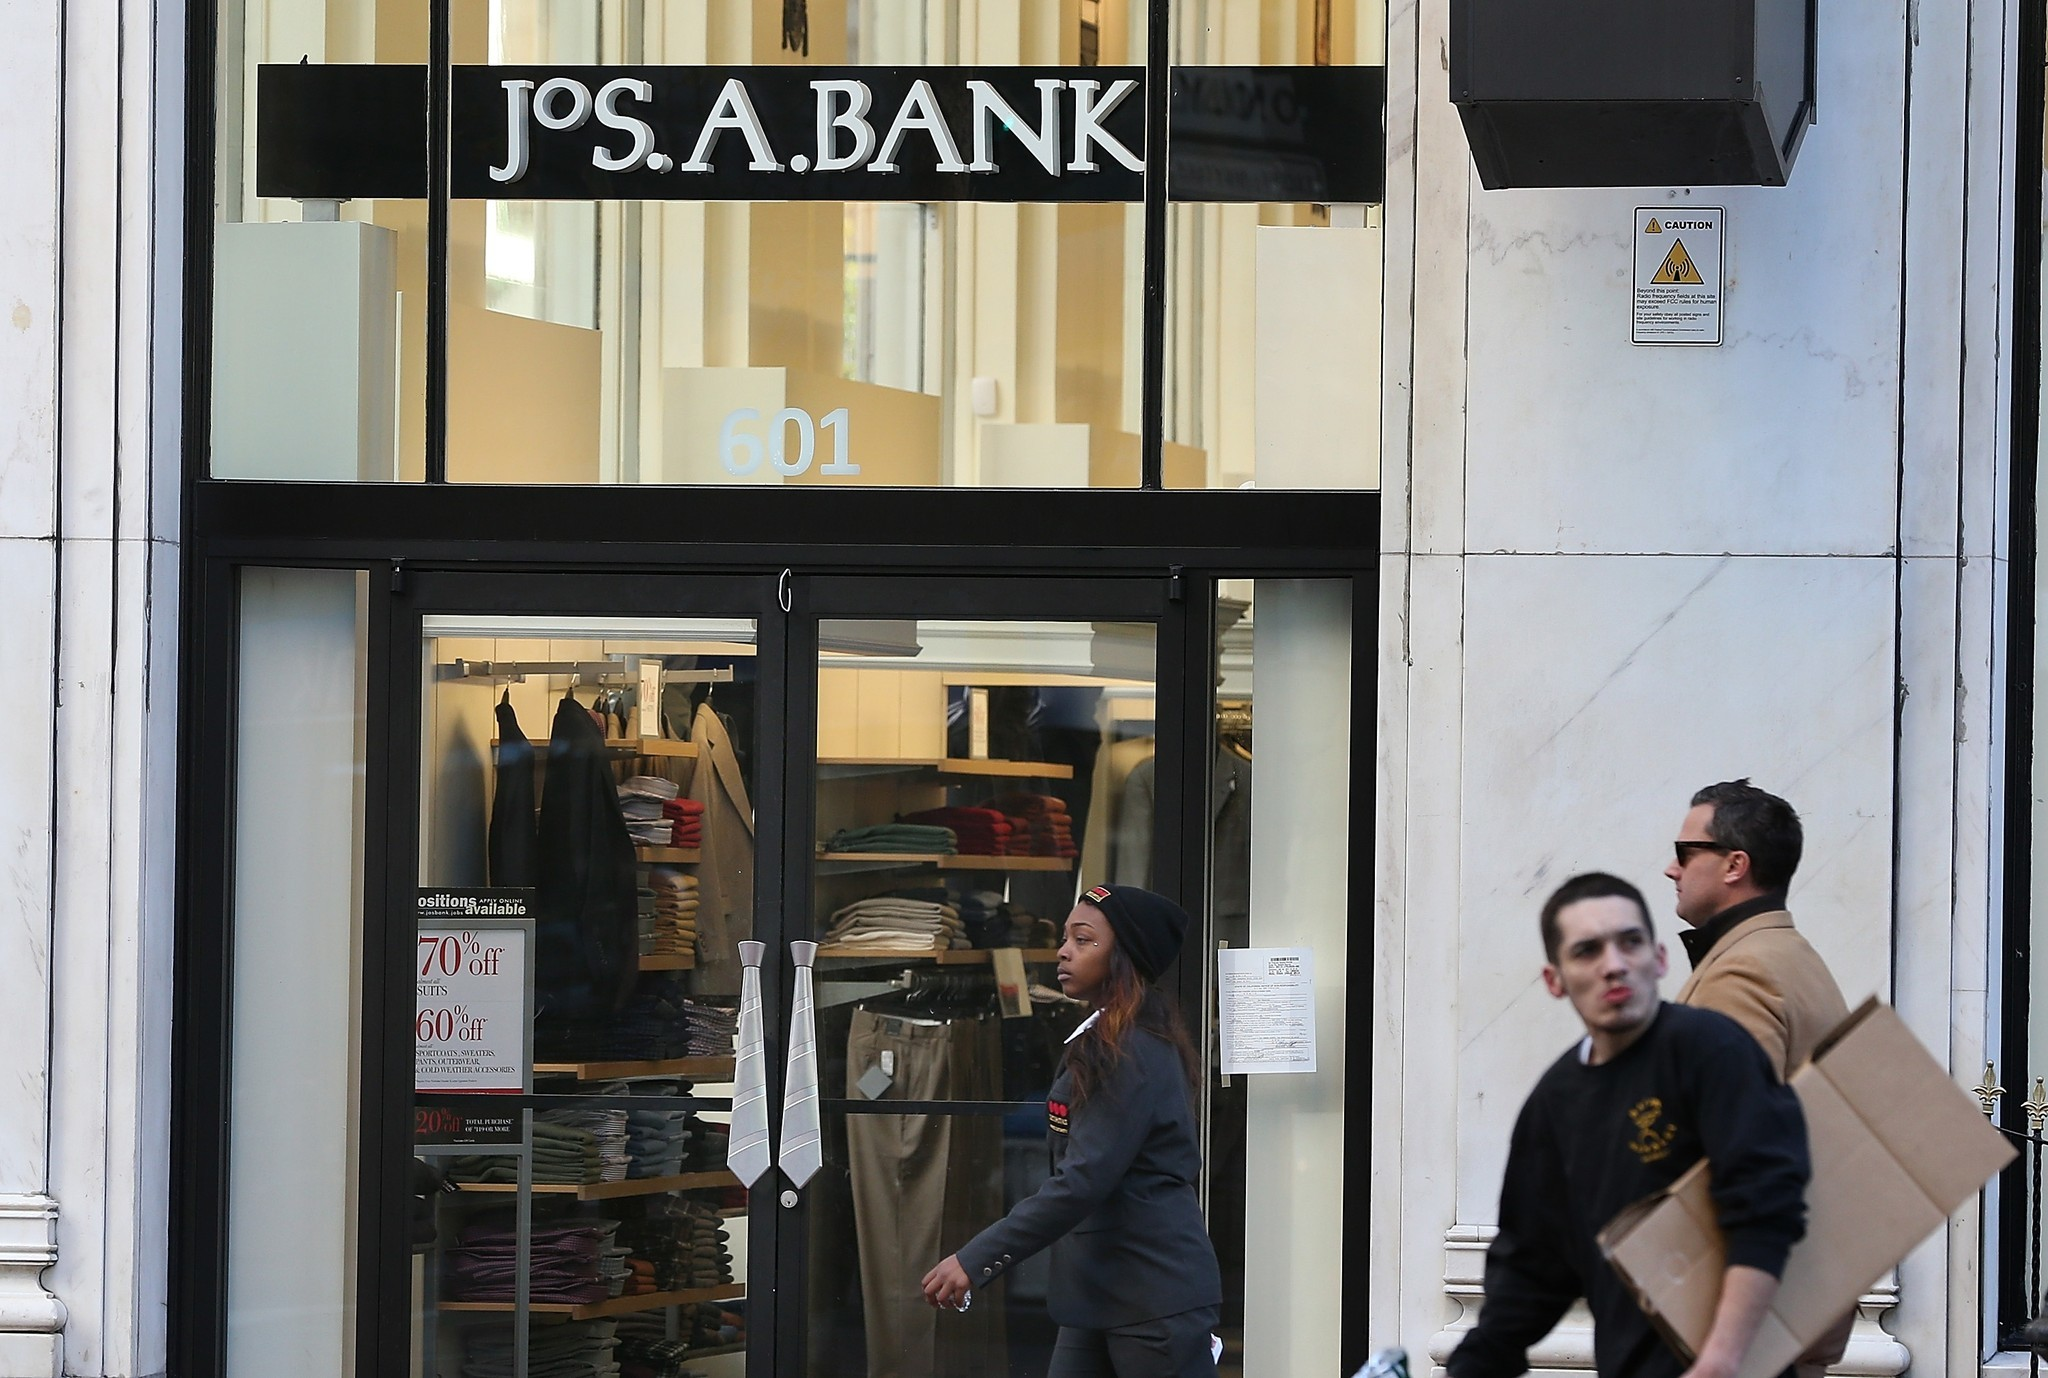 Joseph a bank clothing store